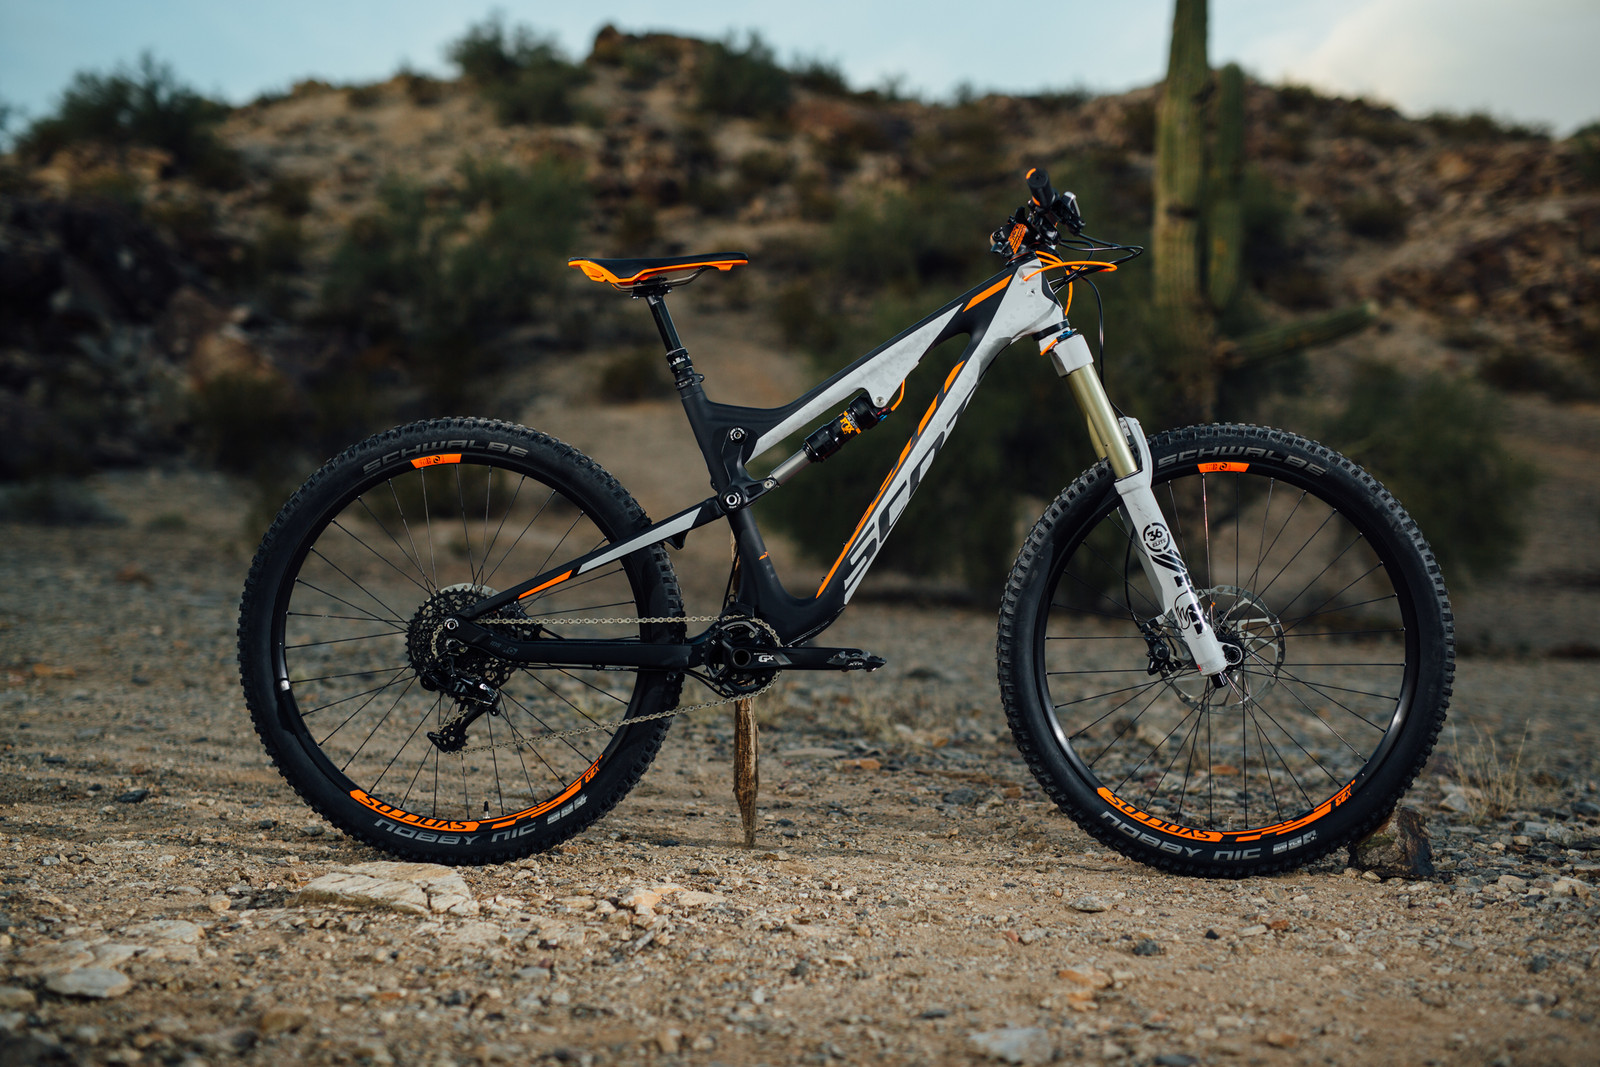 Scott Genius LT 710 - 2016 Vital MTB Test Sessions - Scott Genius LT 710 - 2016 Vital MTB Test Sessions - Mountain Biking Pictures - Vital MTB